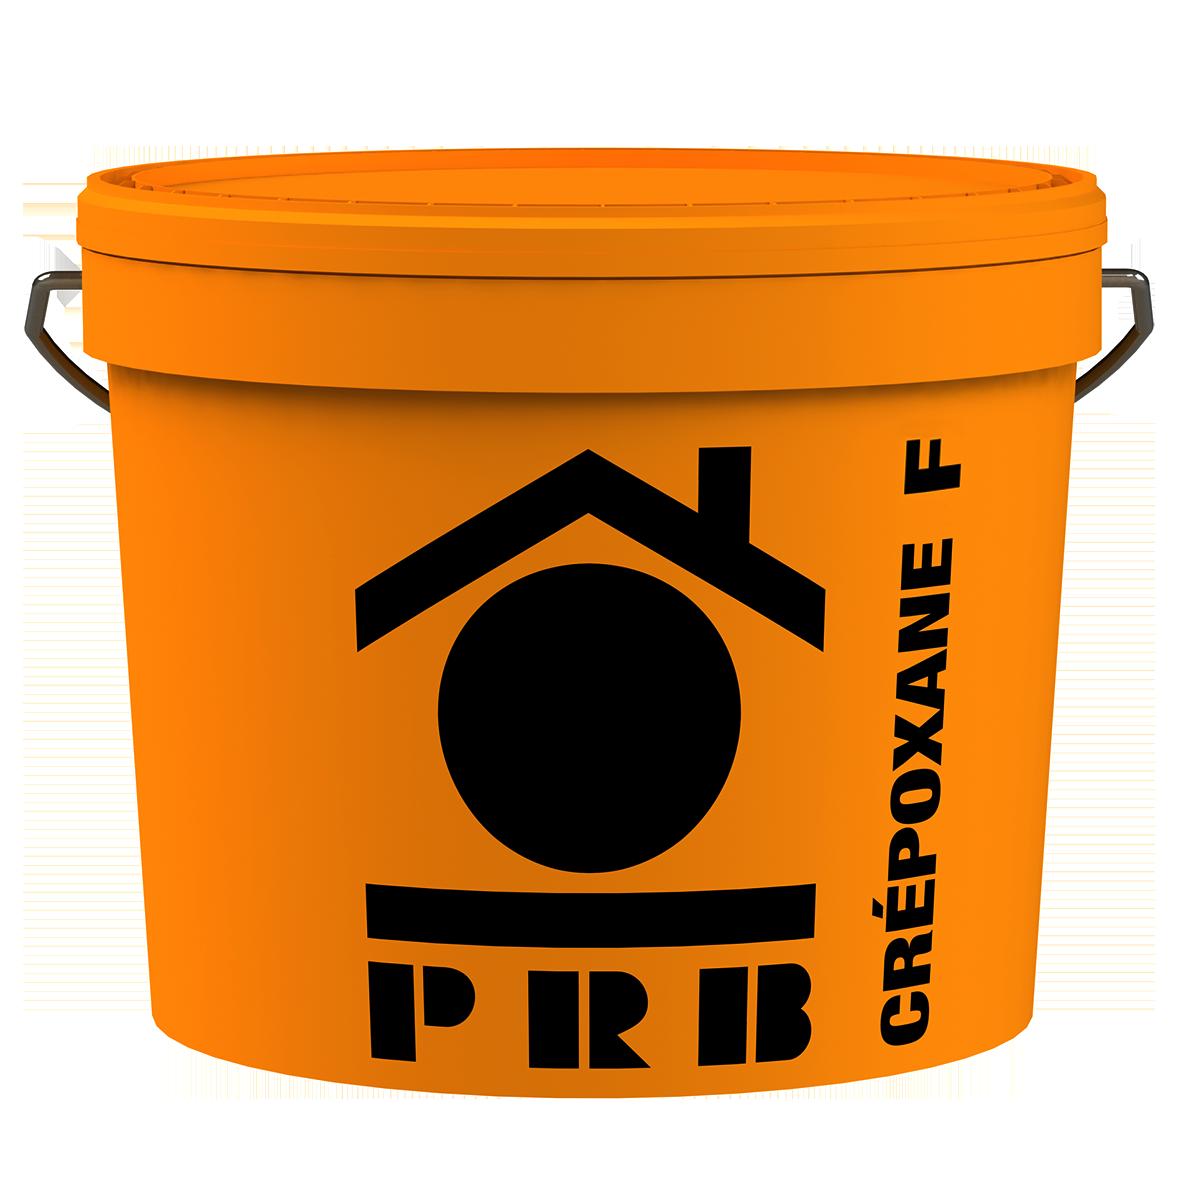 PRB CREPOXANE F 25 KG